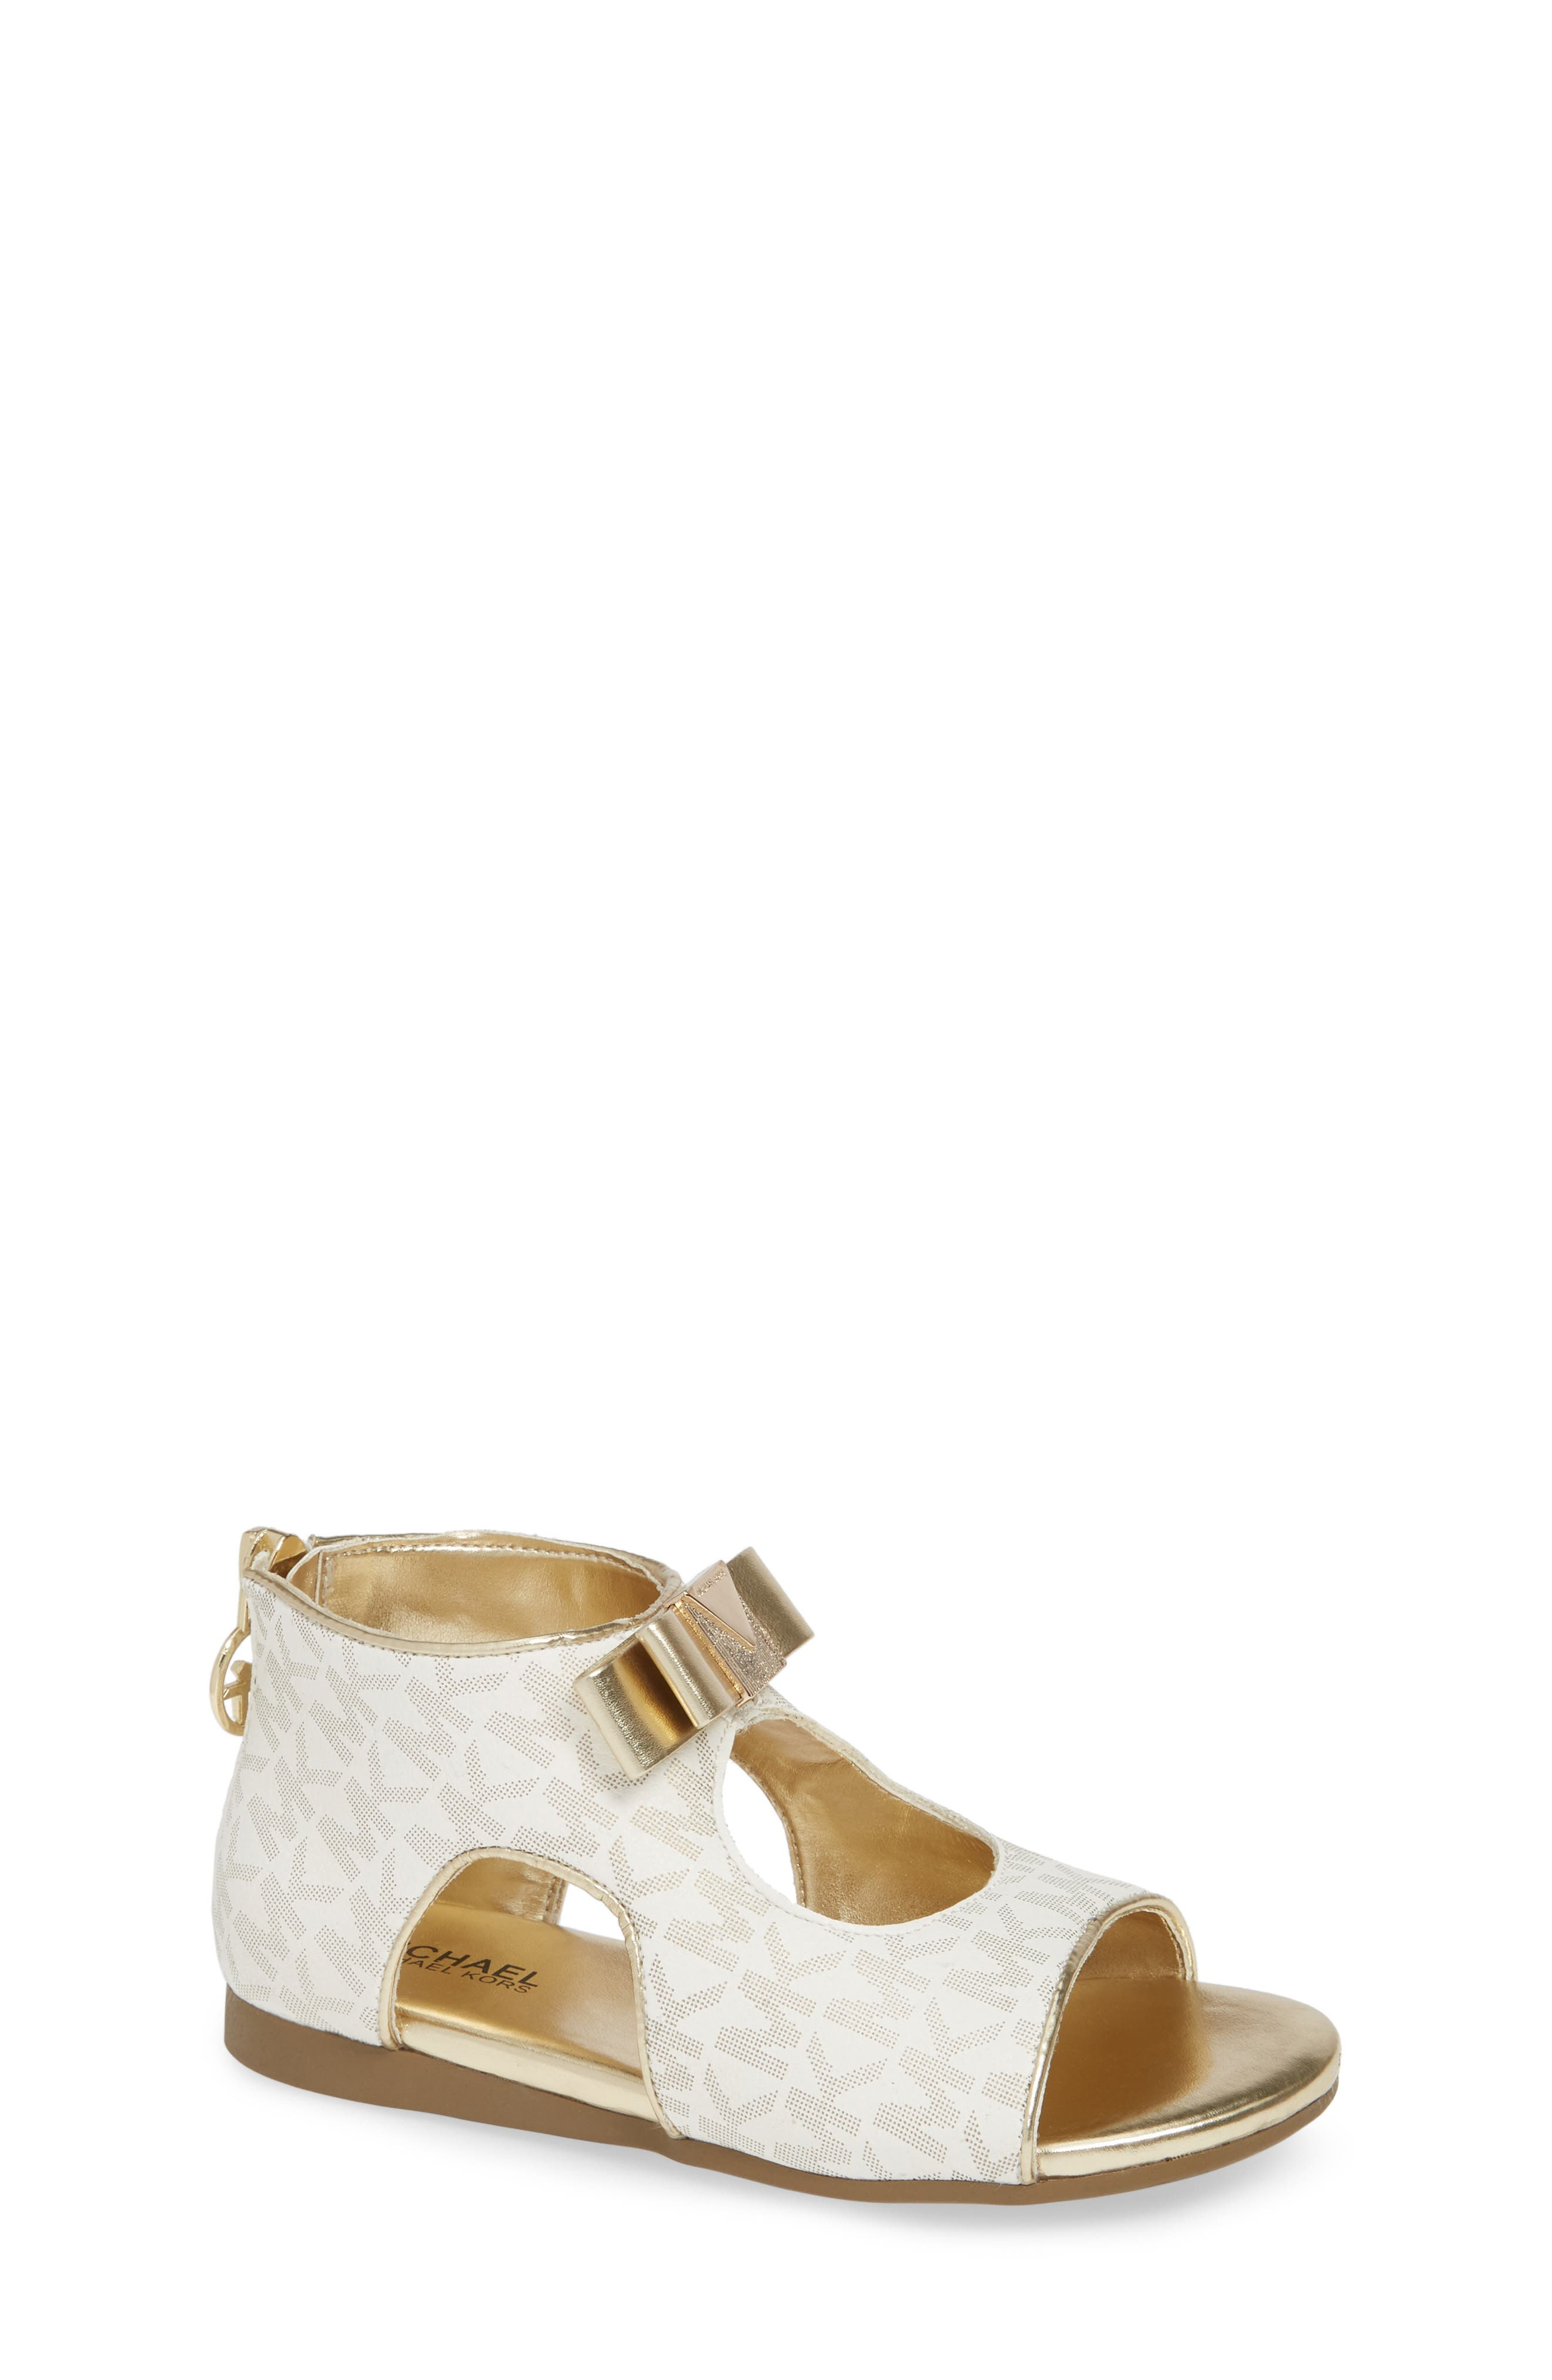 MICHAEL MICHAEL KORS, Tilly Dahna Logo Sandal, Main thumbnail 1, color, GOLD/ WHITE